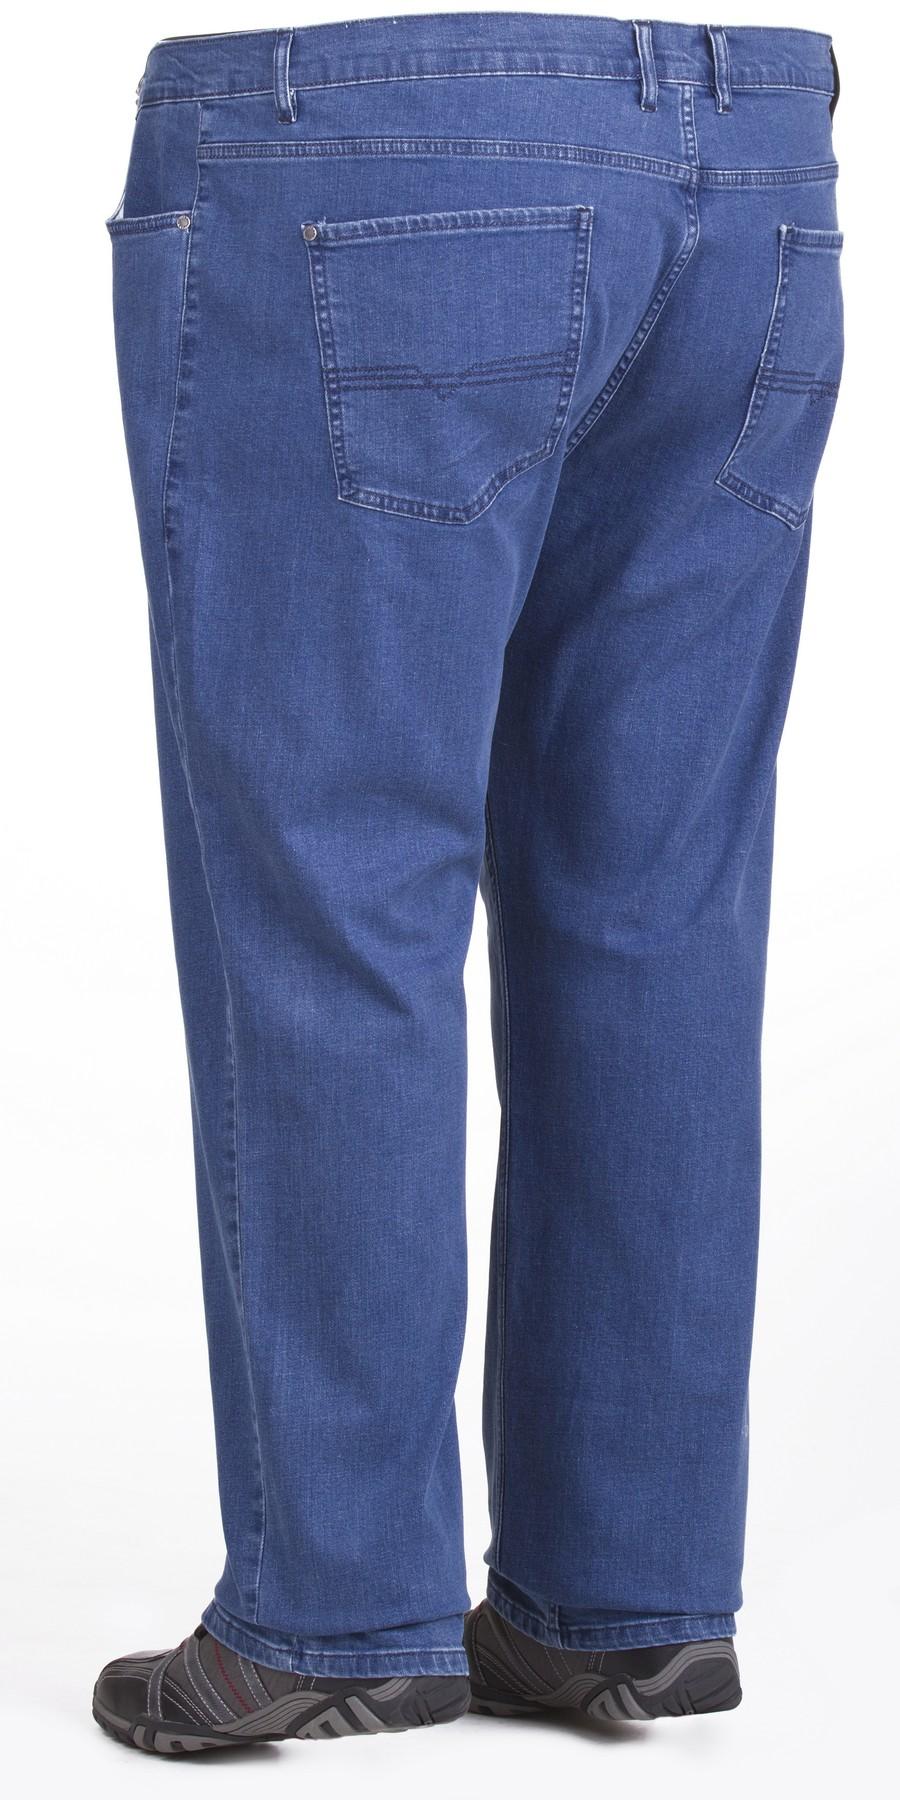 SURCO spodnie 3XL 4XL 5XL 6XL 7XL 8XL